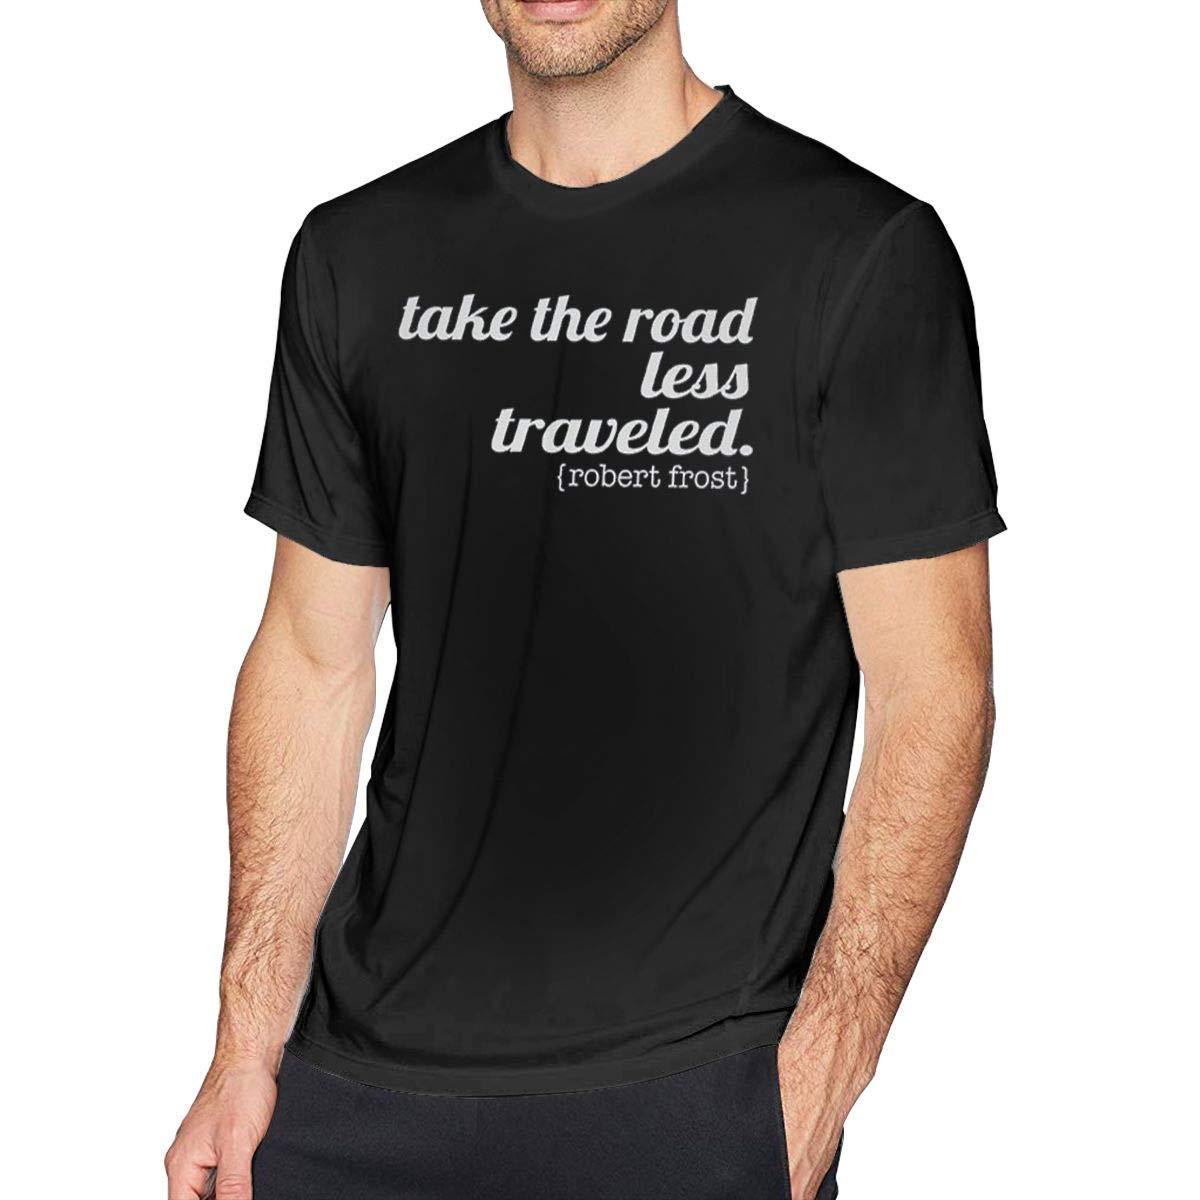 Gjfauehf Take The Road Less Traveled T Shirts